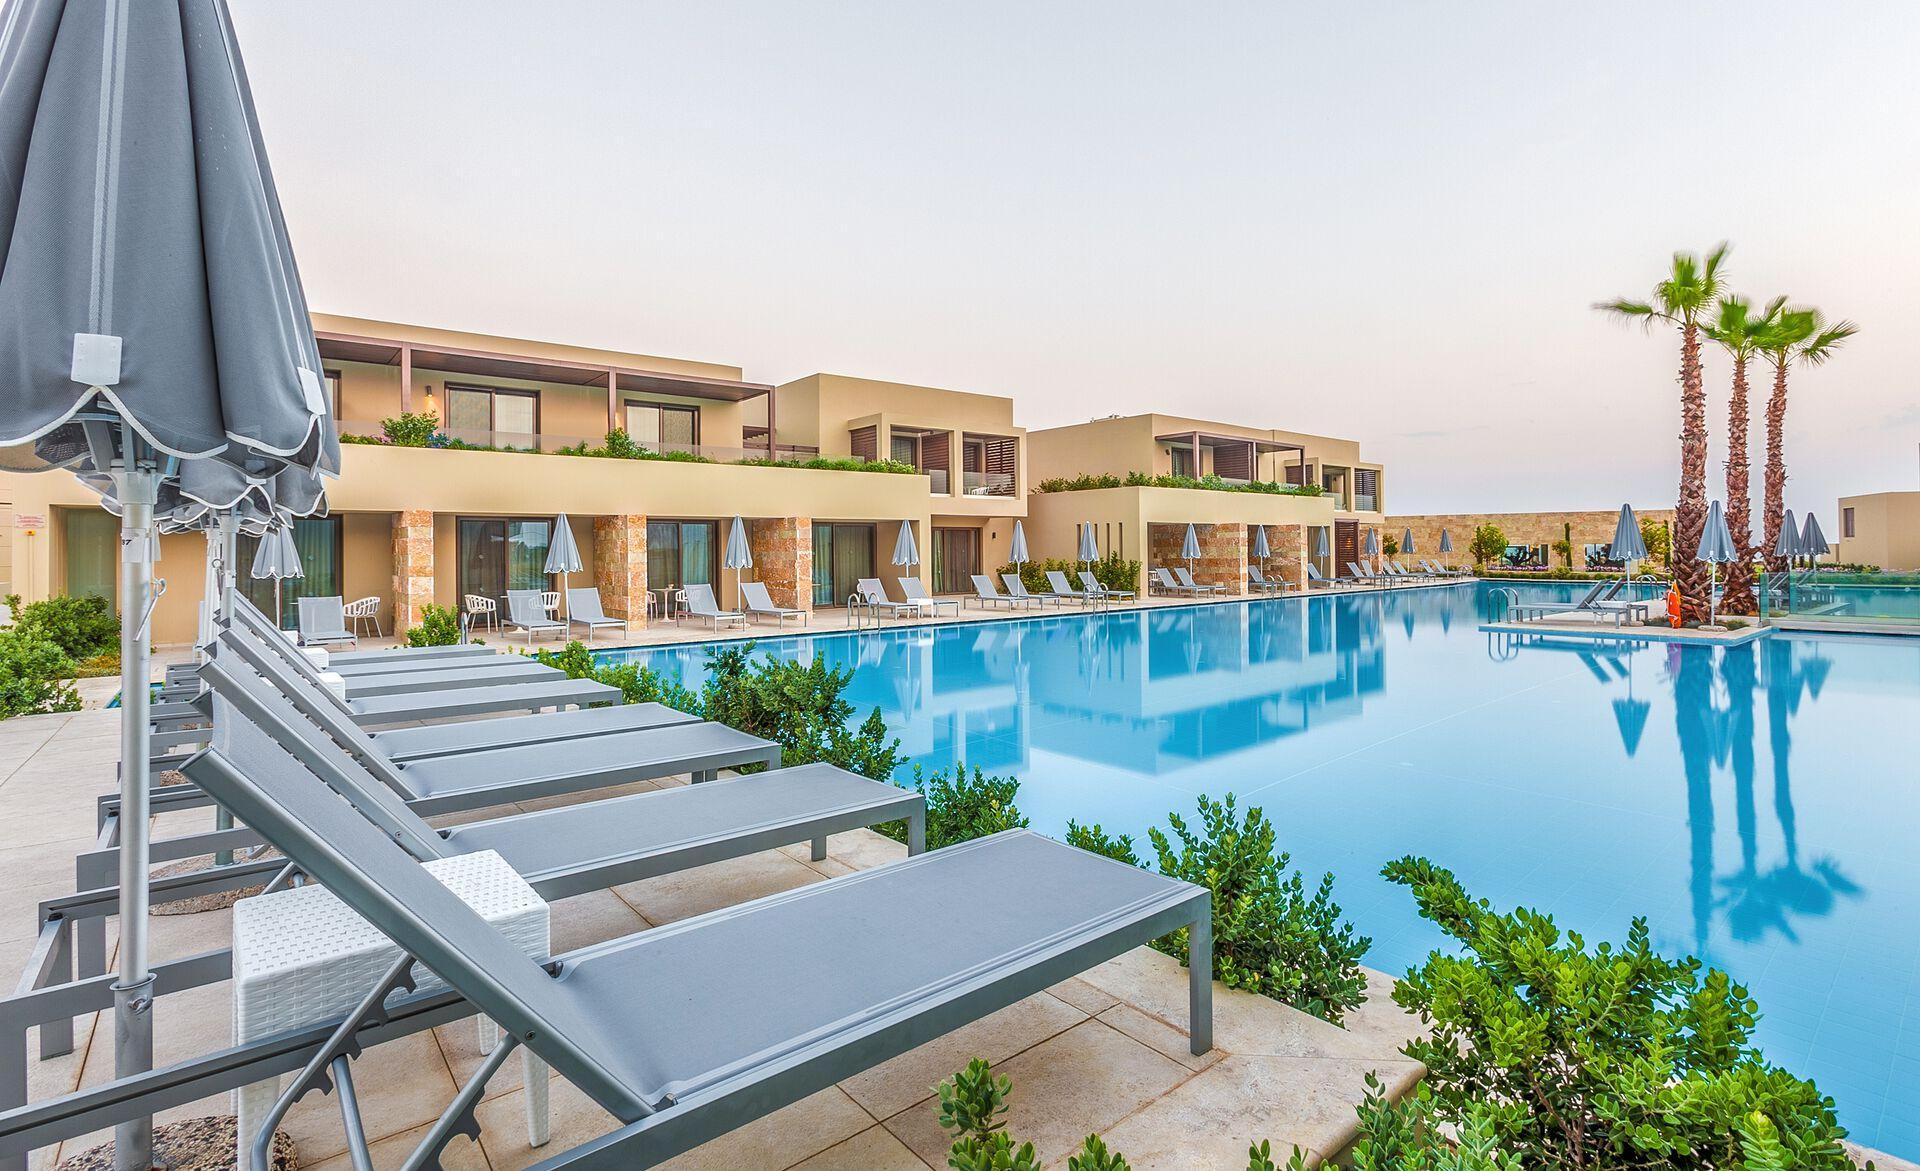 Grèce - Iles grecques - Kos - Hôtel Astir Odysseus 5*